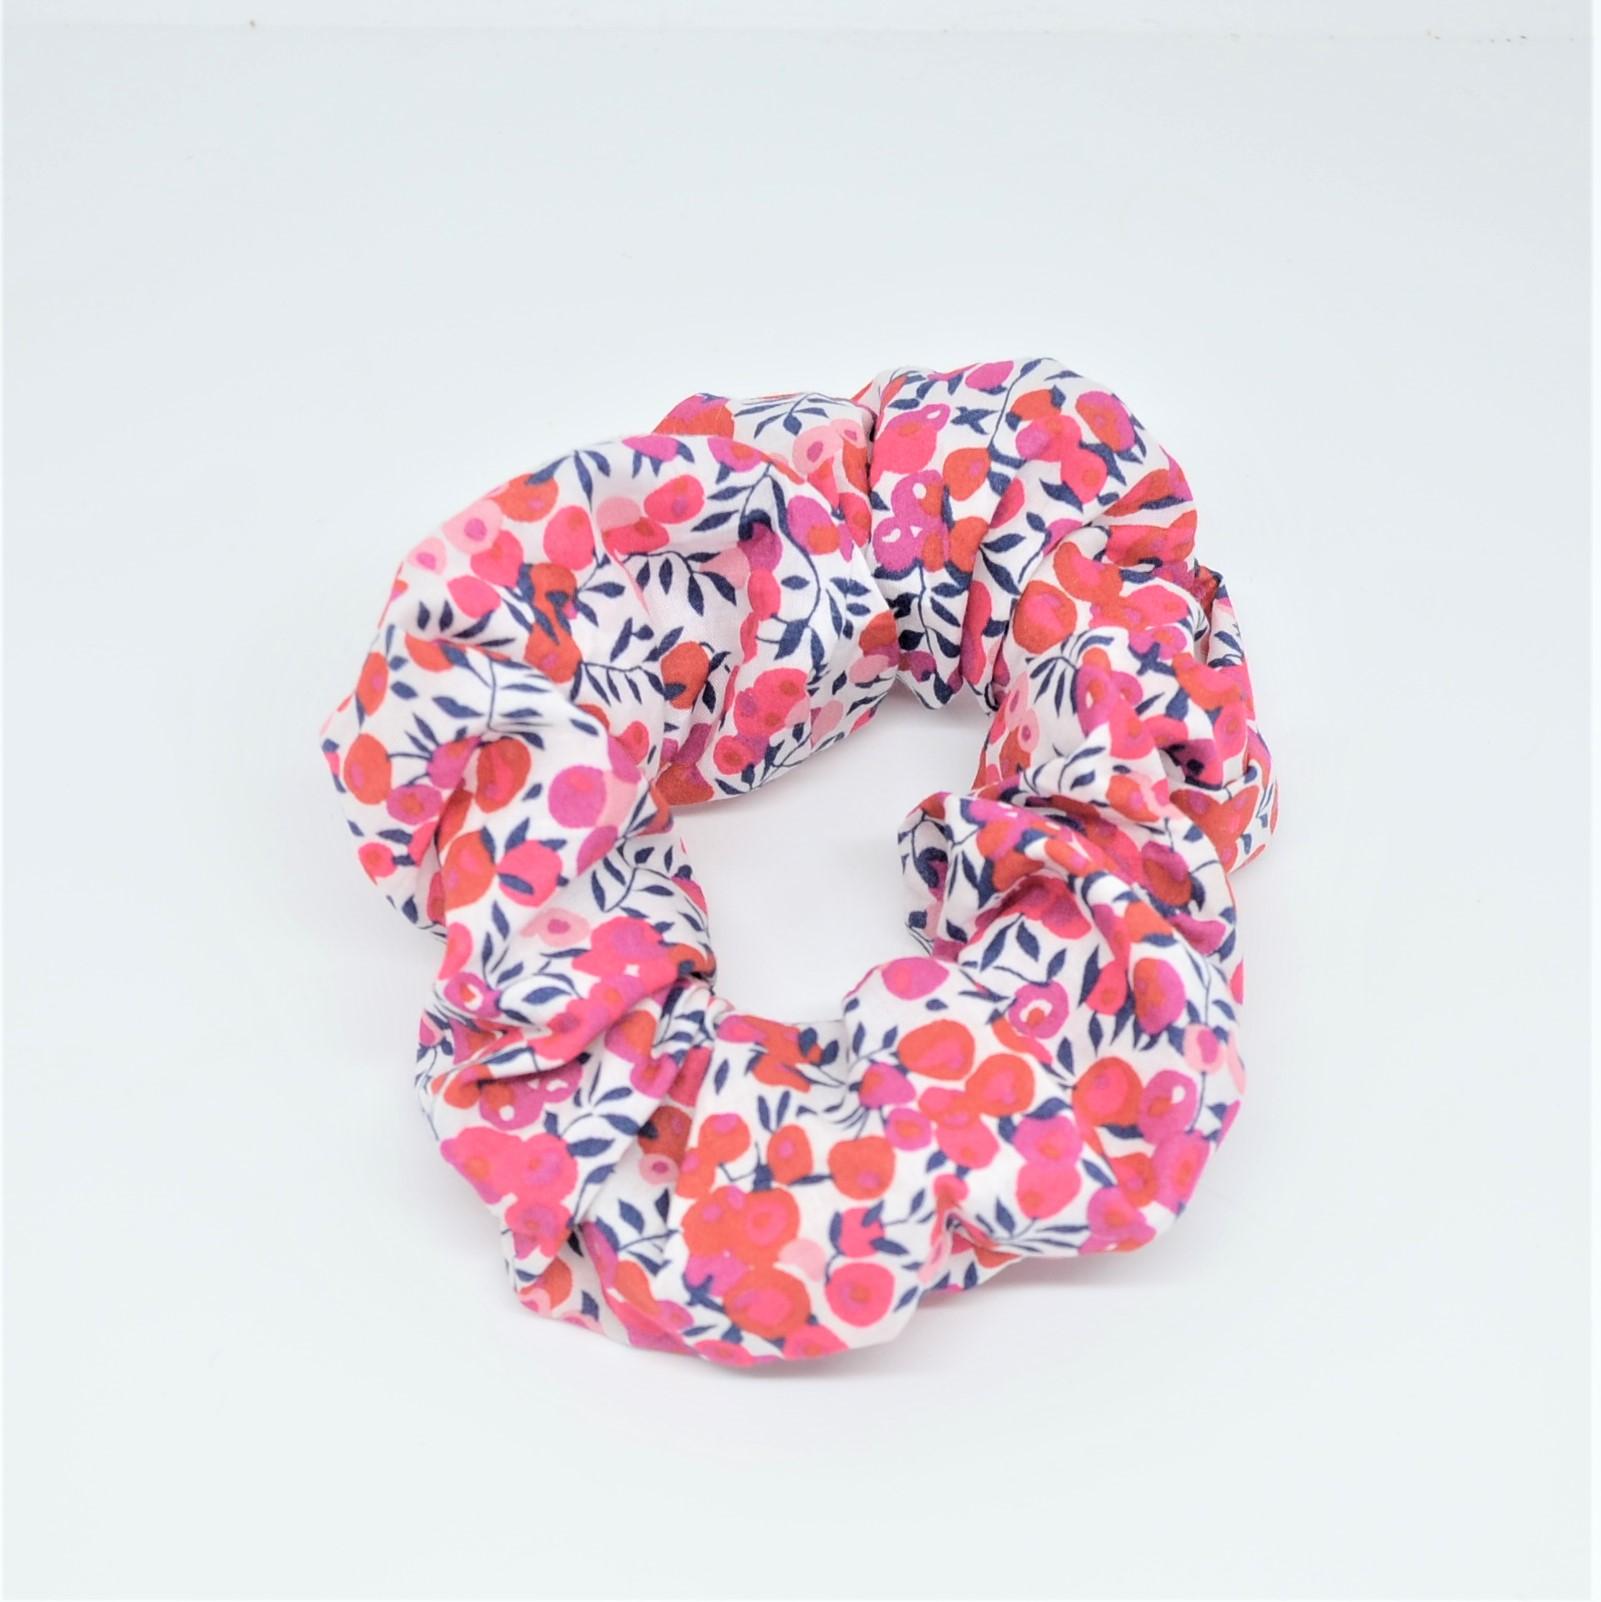 Chouchou cheveux scrunchie liberty Wiltshire rouge--9996010490027